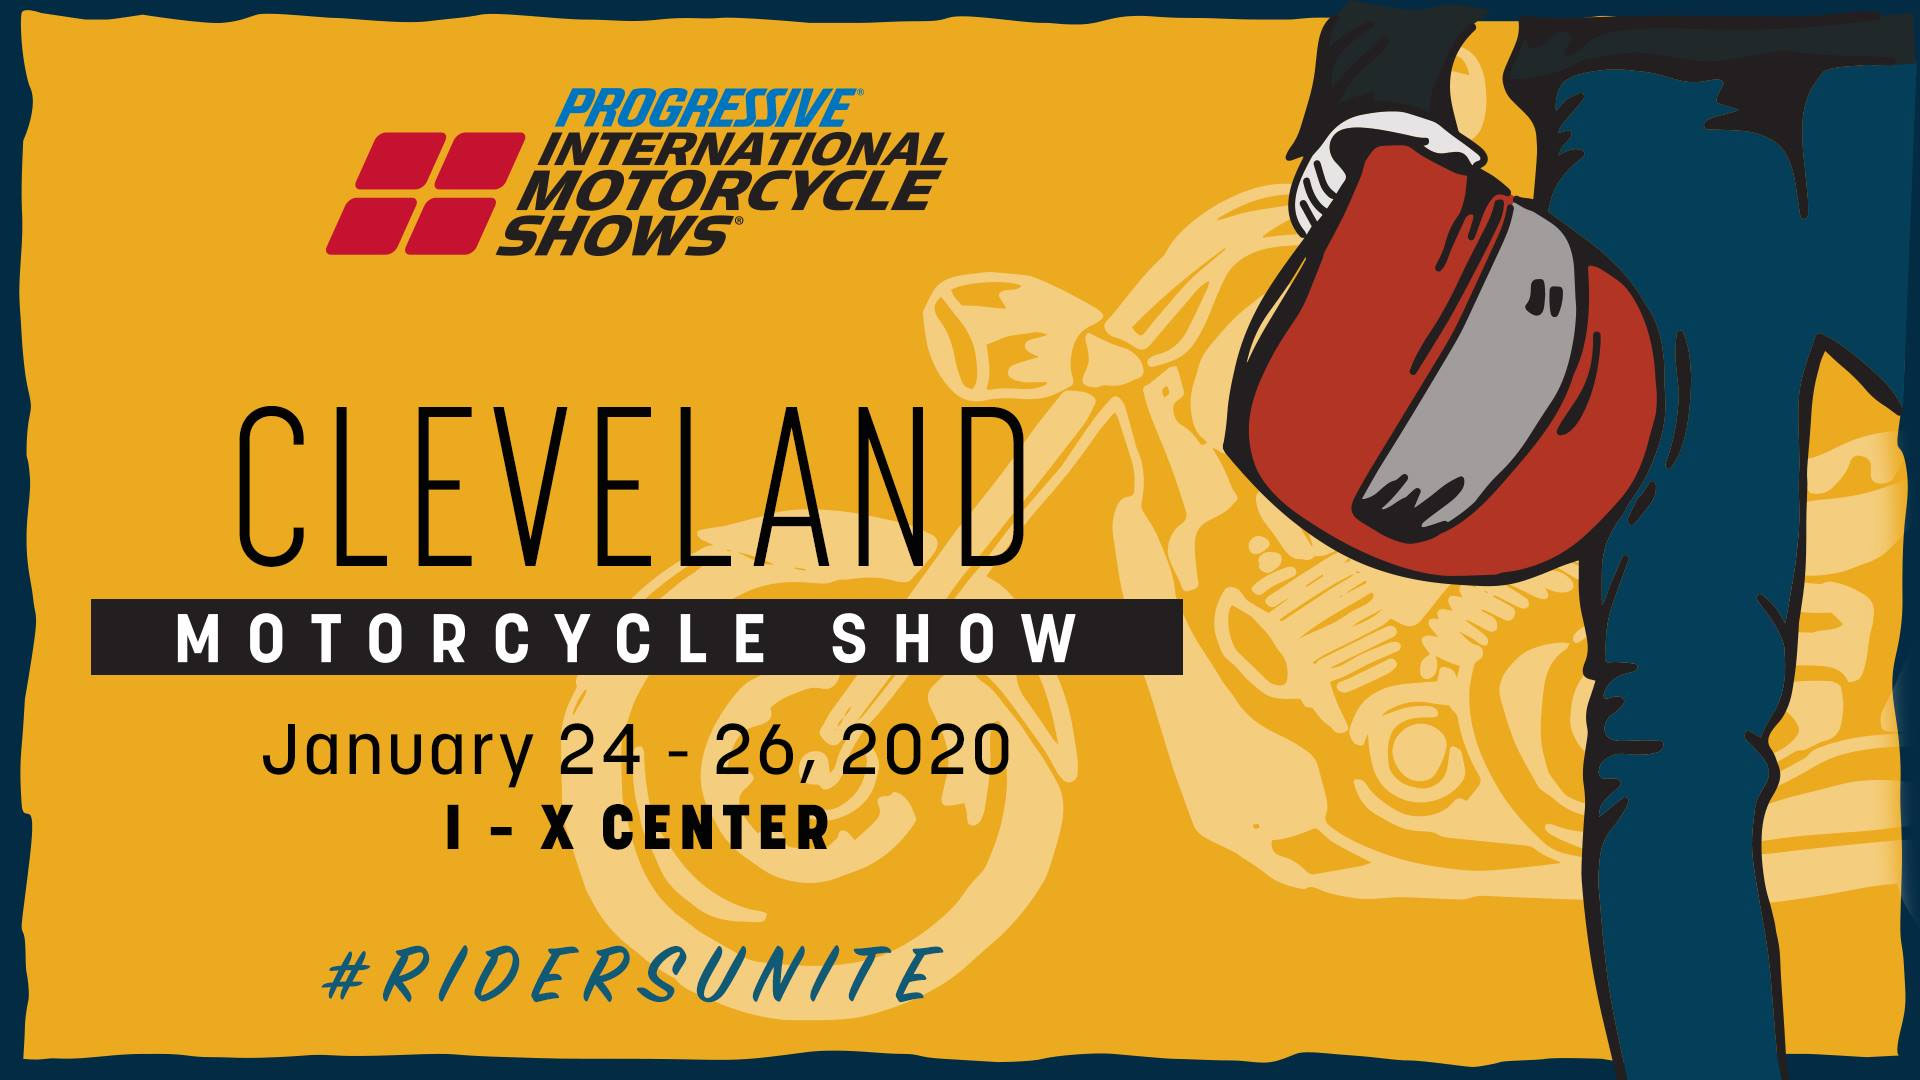 Progressive International Motorcycle Show - Cleveland Cleveland,OH